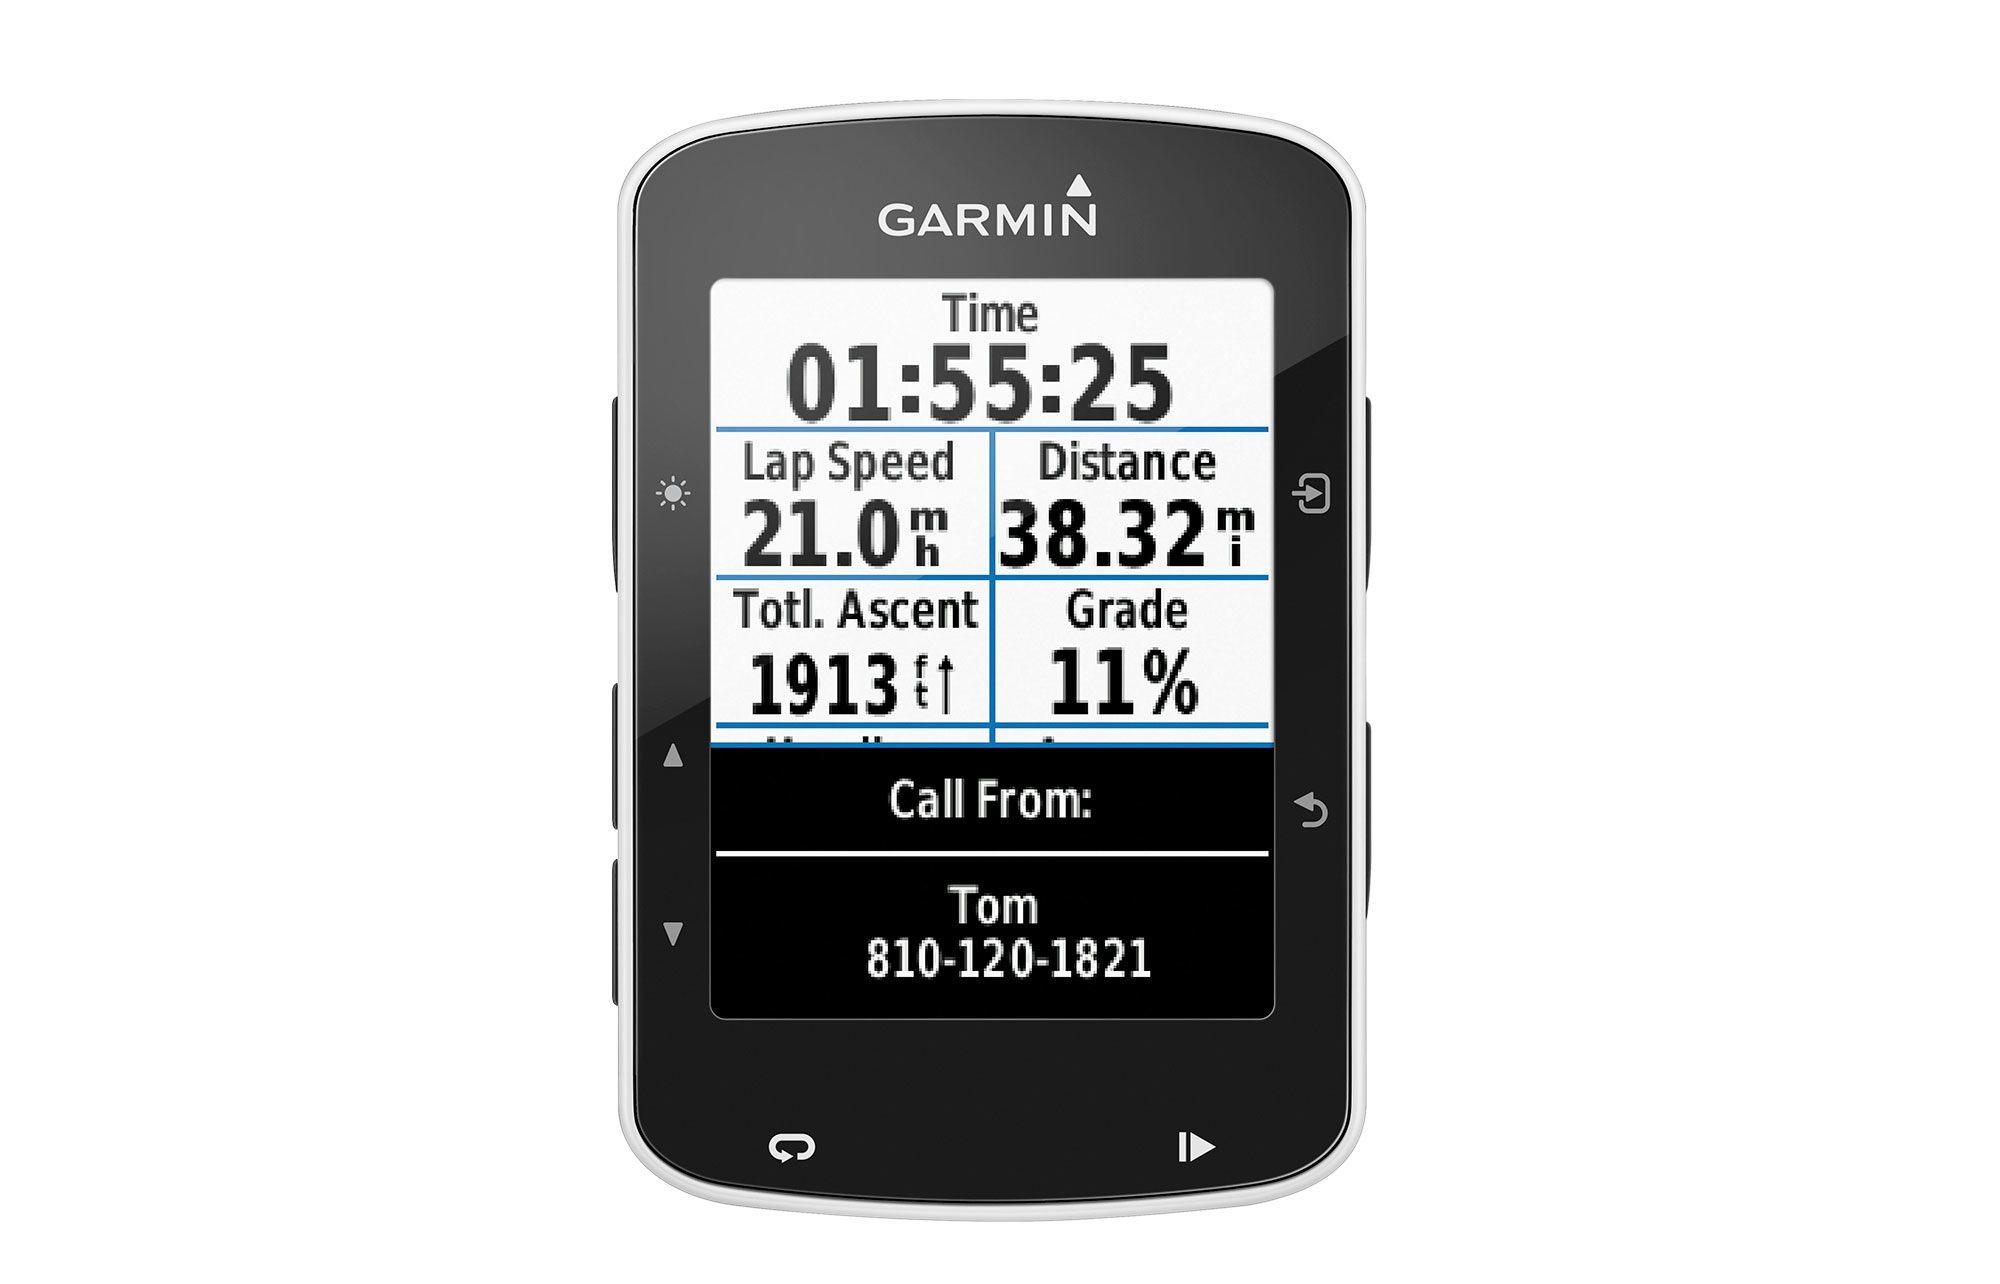 Garmin edge 520 cycling computer ra cycles buycottarizona Gallery